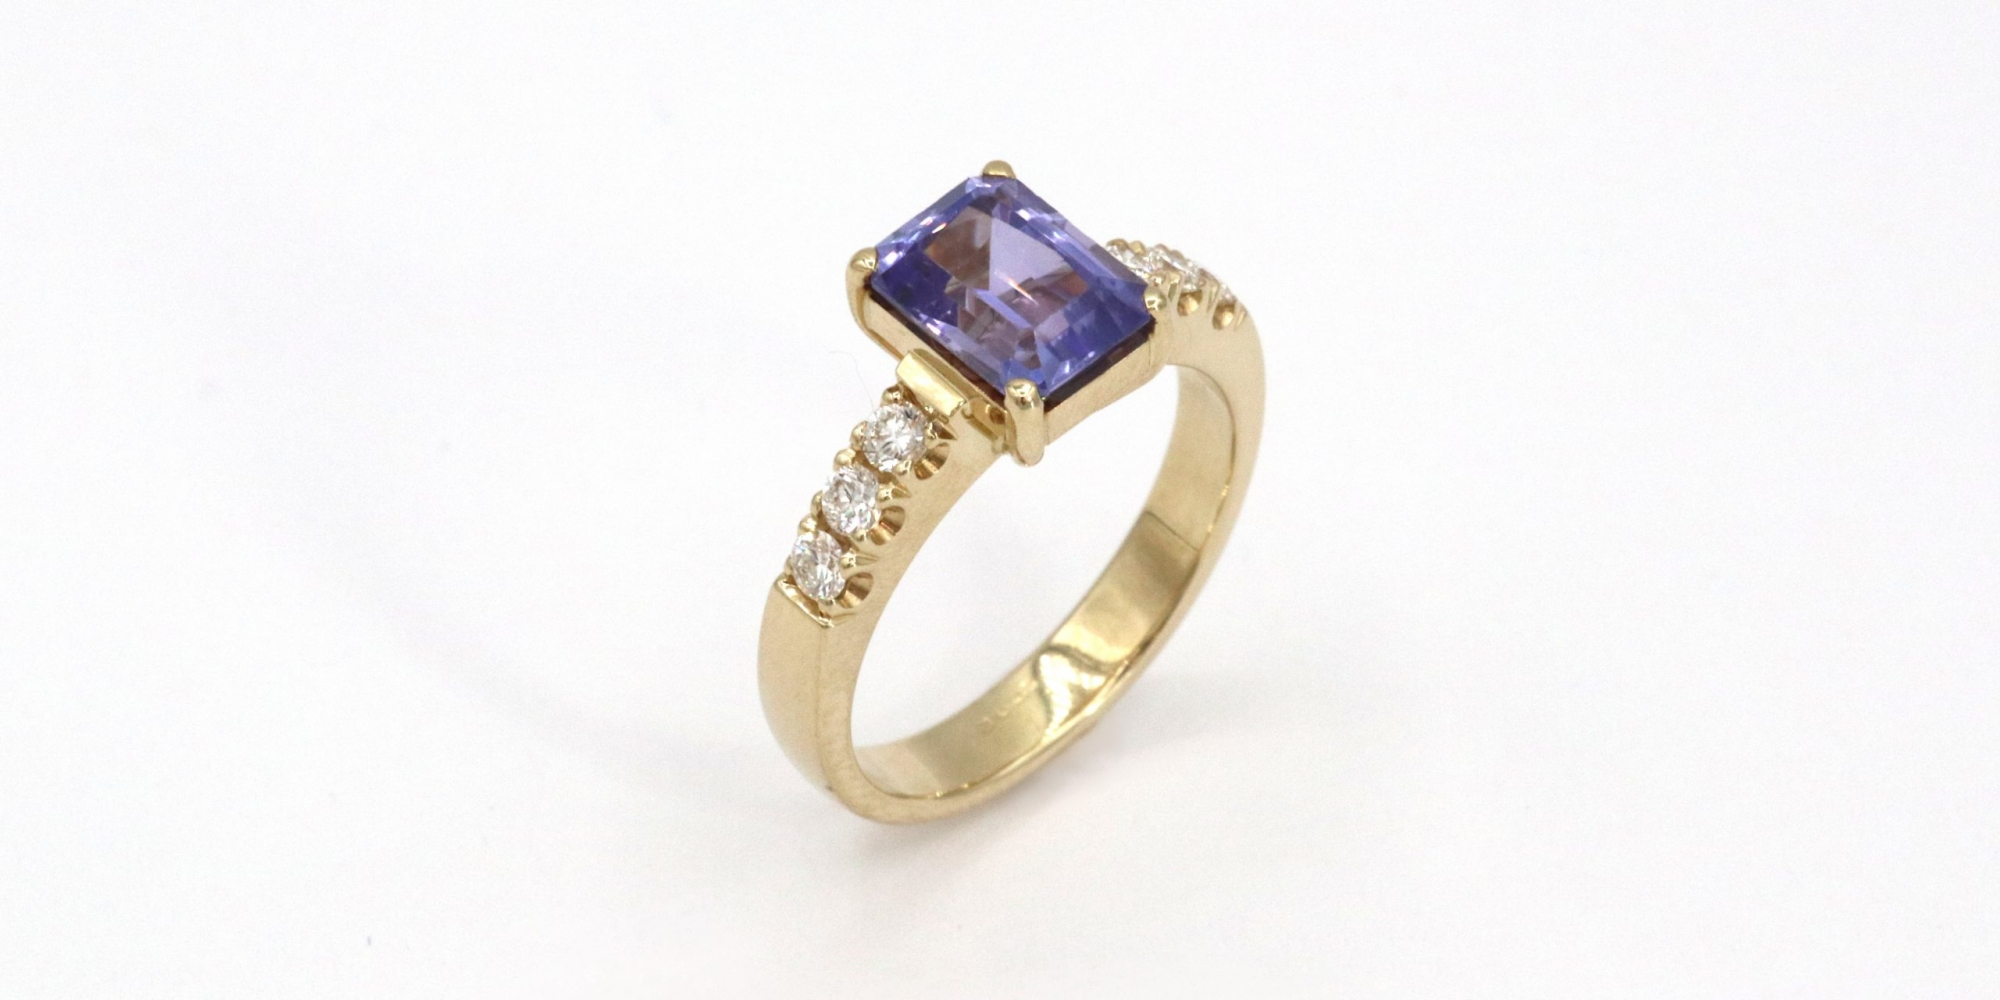 id592.Iolit.Ring.Goldschmiede.Mace.2000×1000